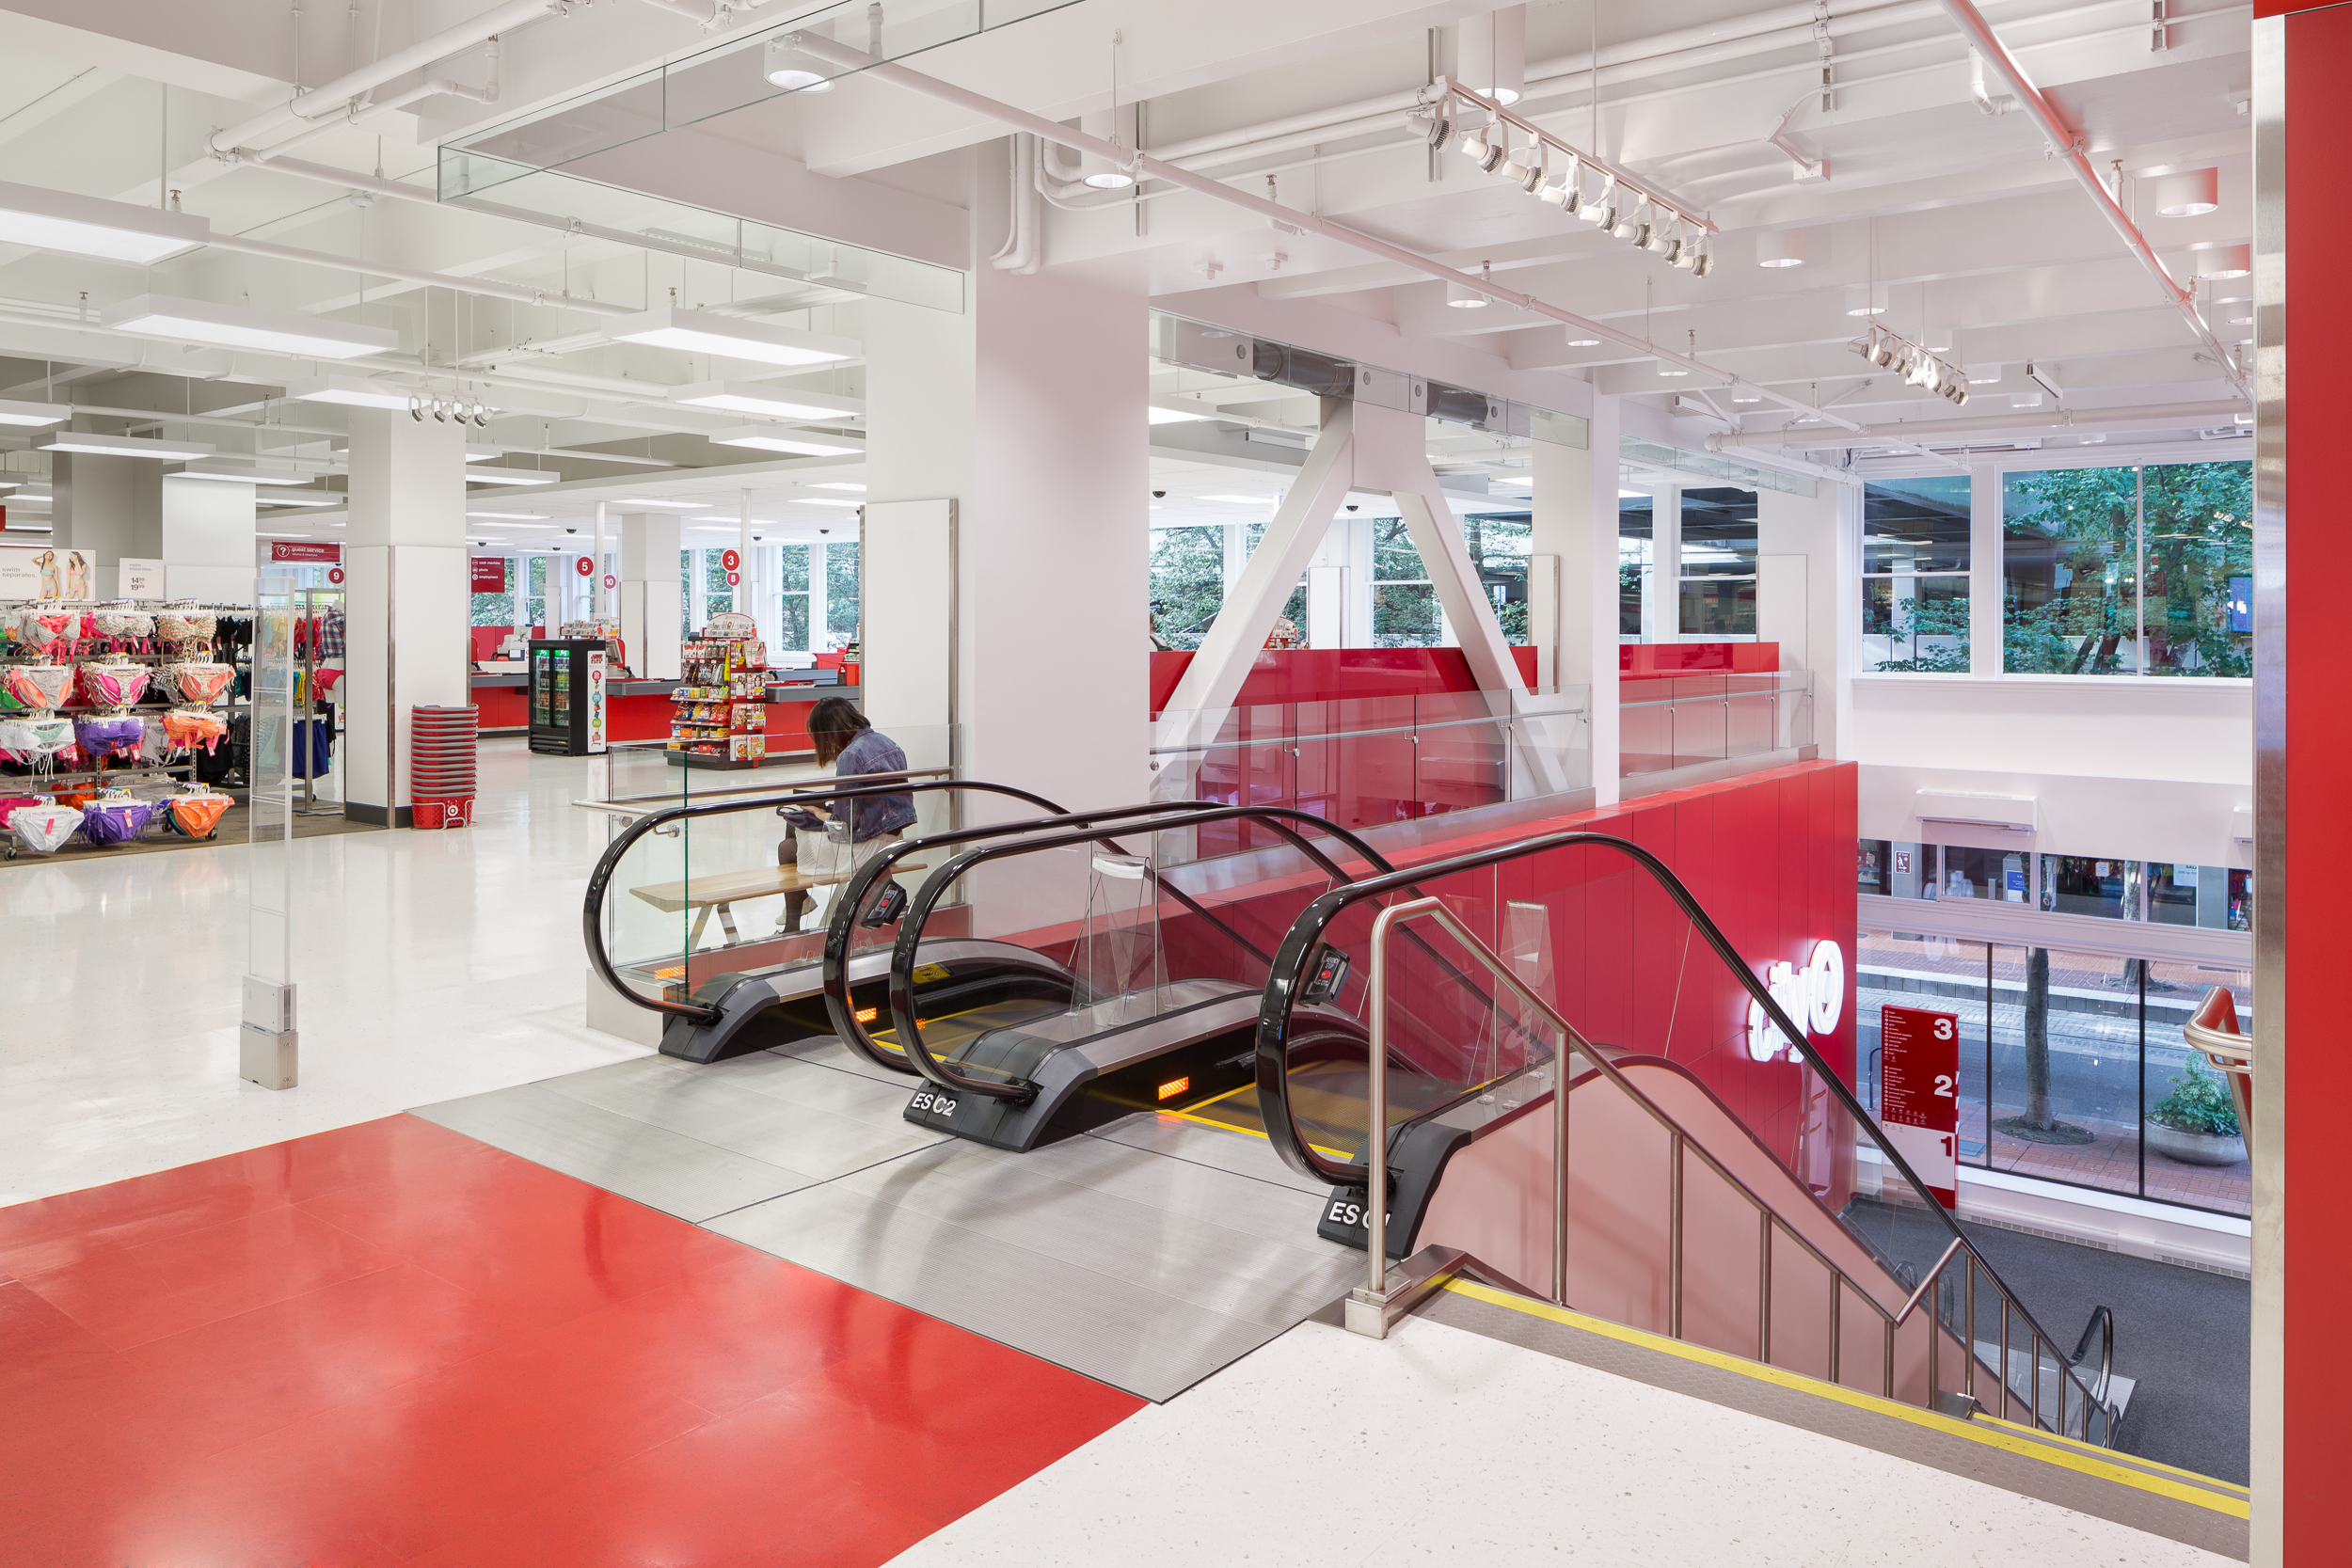 15-Galleria-JoshPartee-0022-escalator.jpg